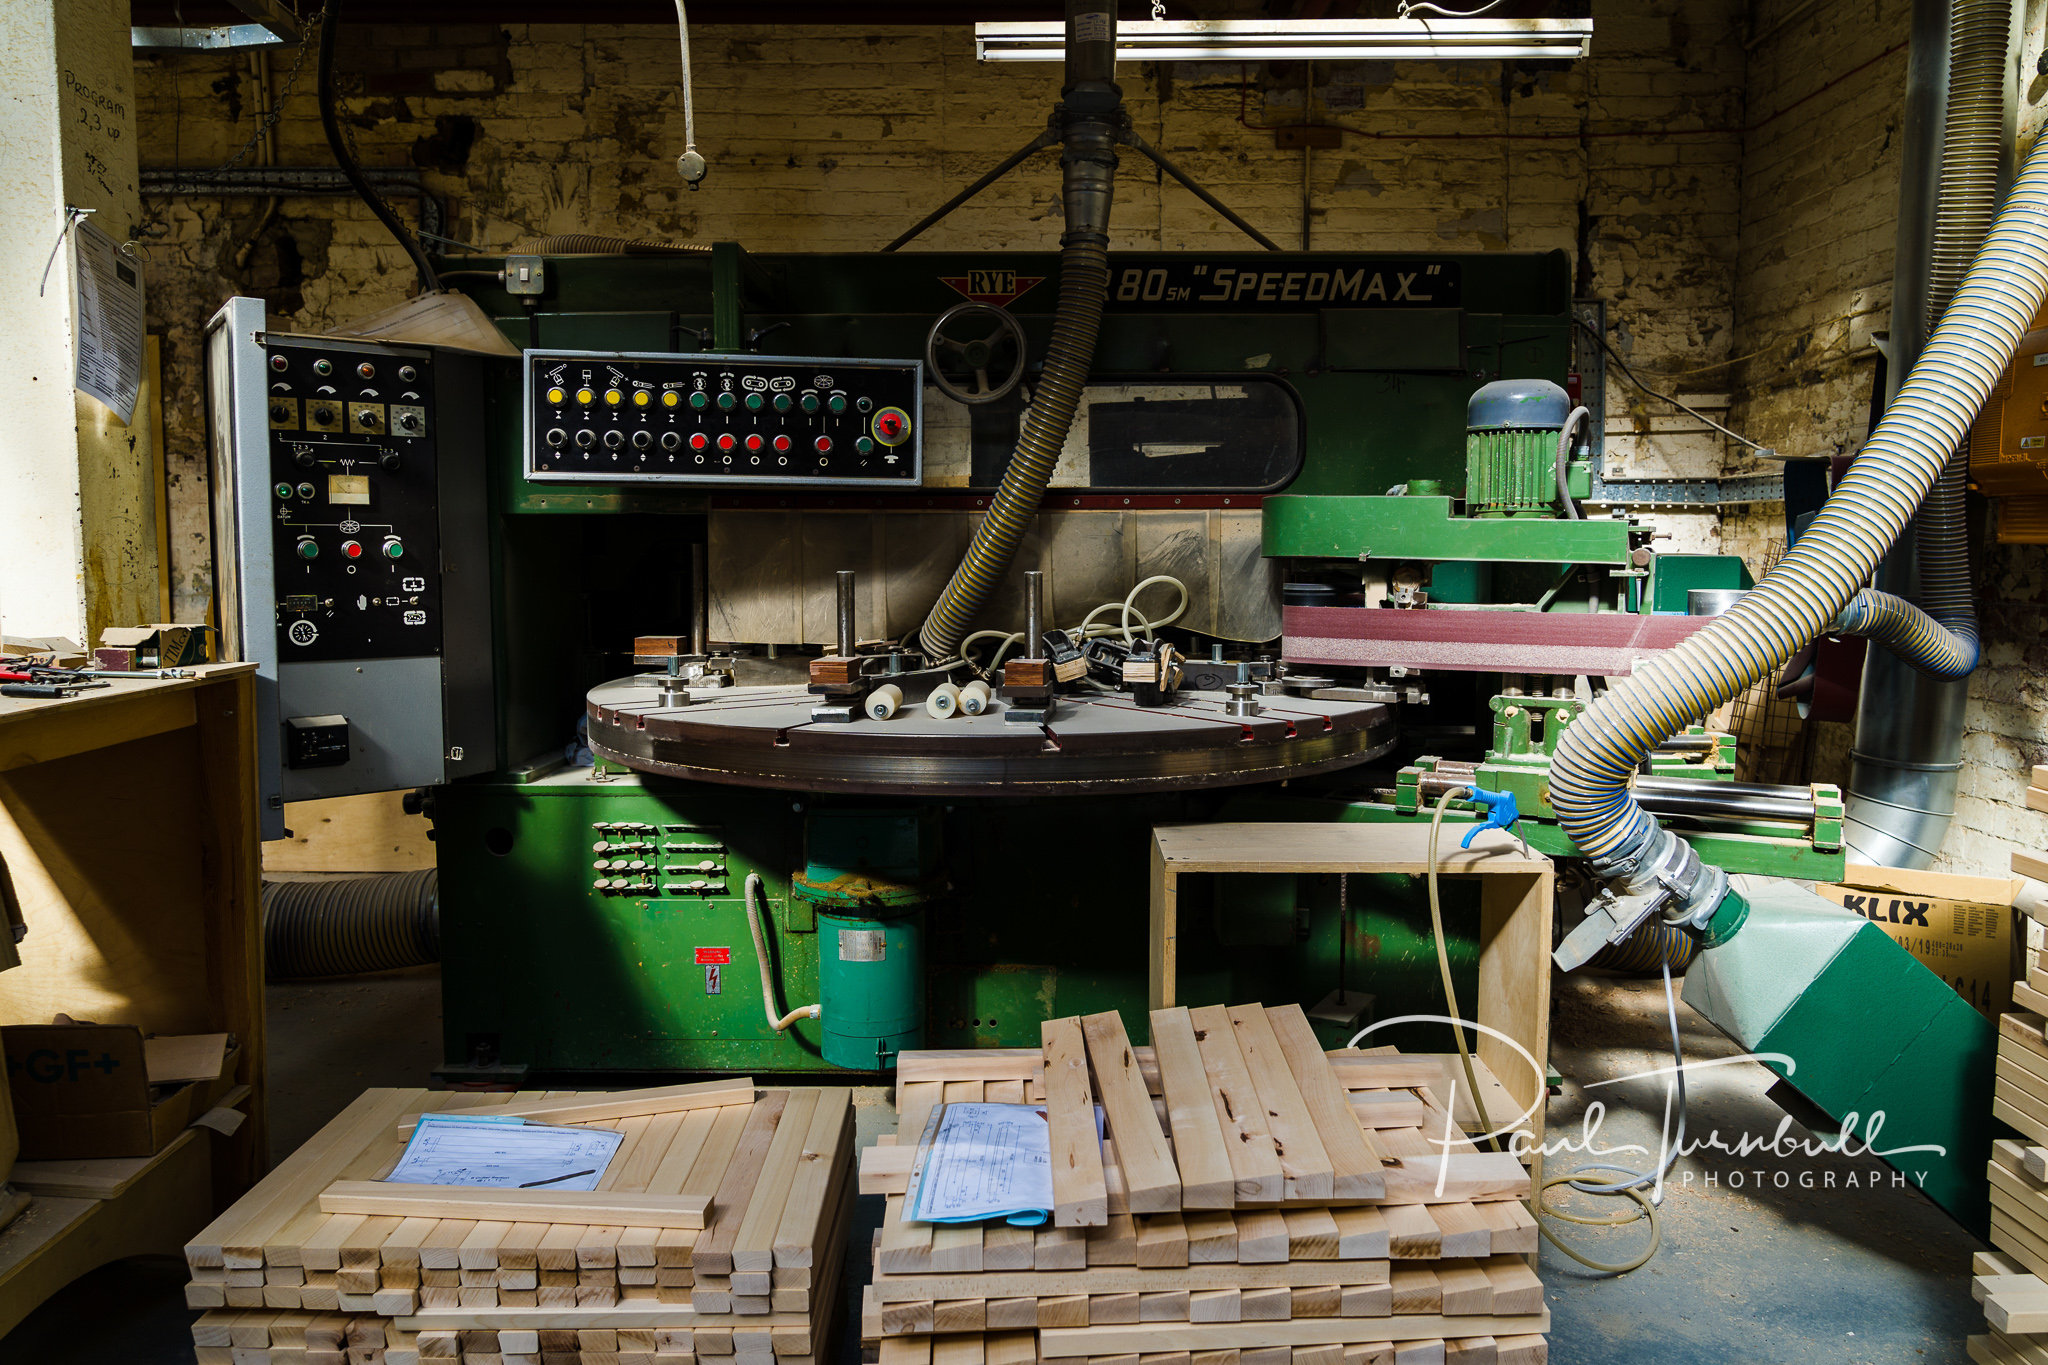 commercial-photographer-leeds-bradford-knightsbridge-furniture-tour-016.jpg